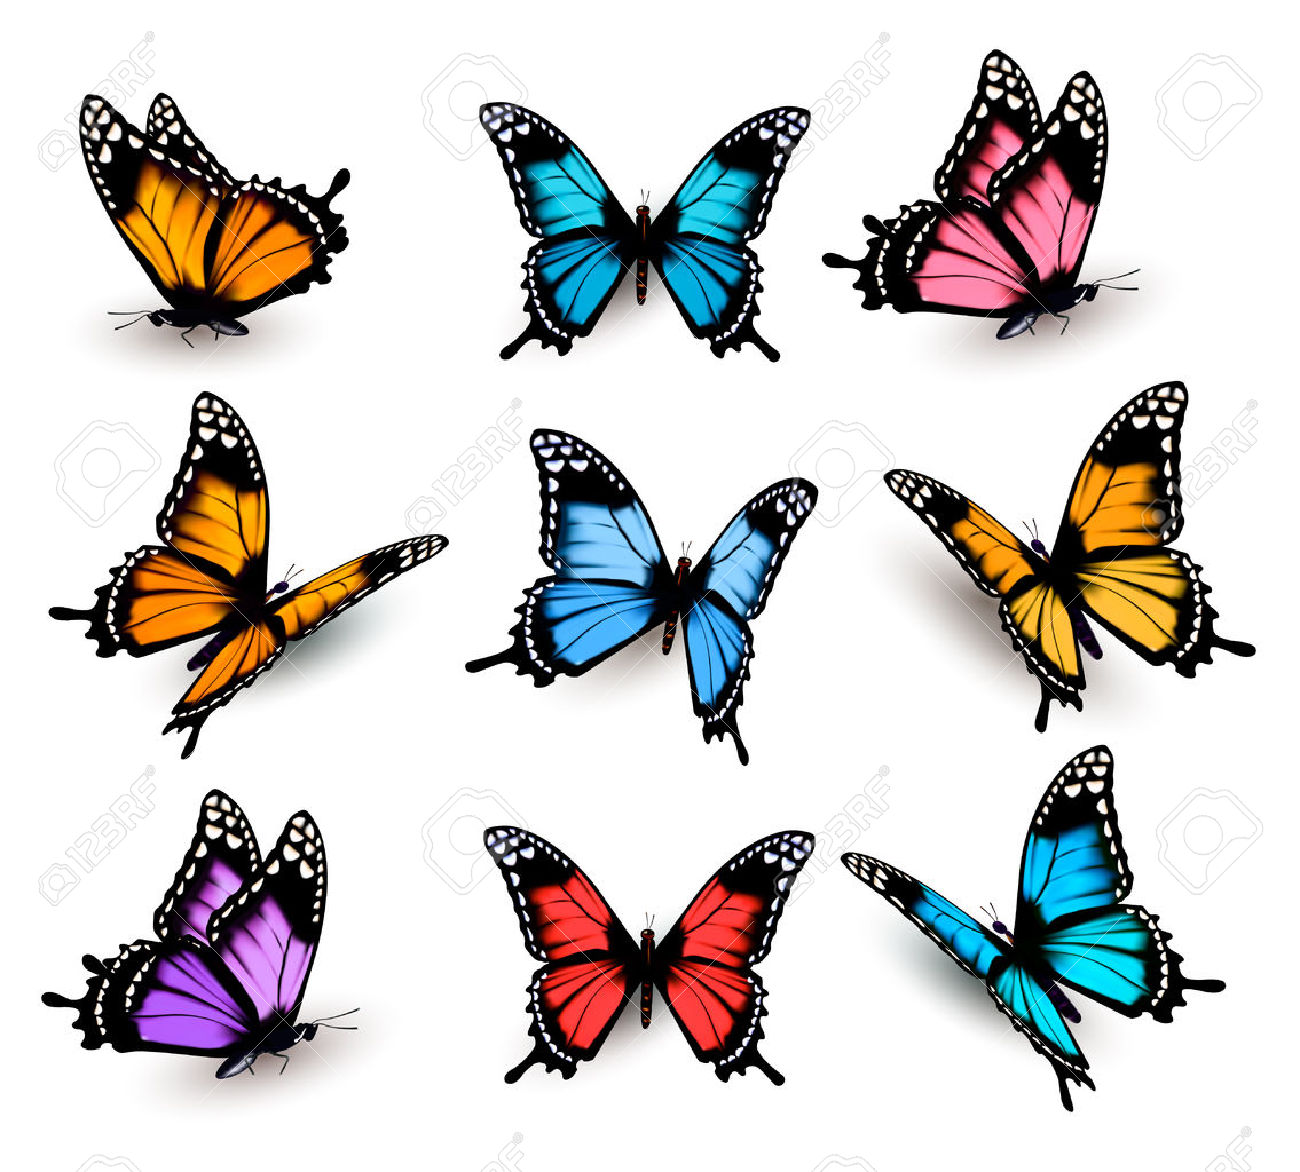 Pindi Moth clipart #5, Download drawings